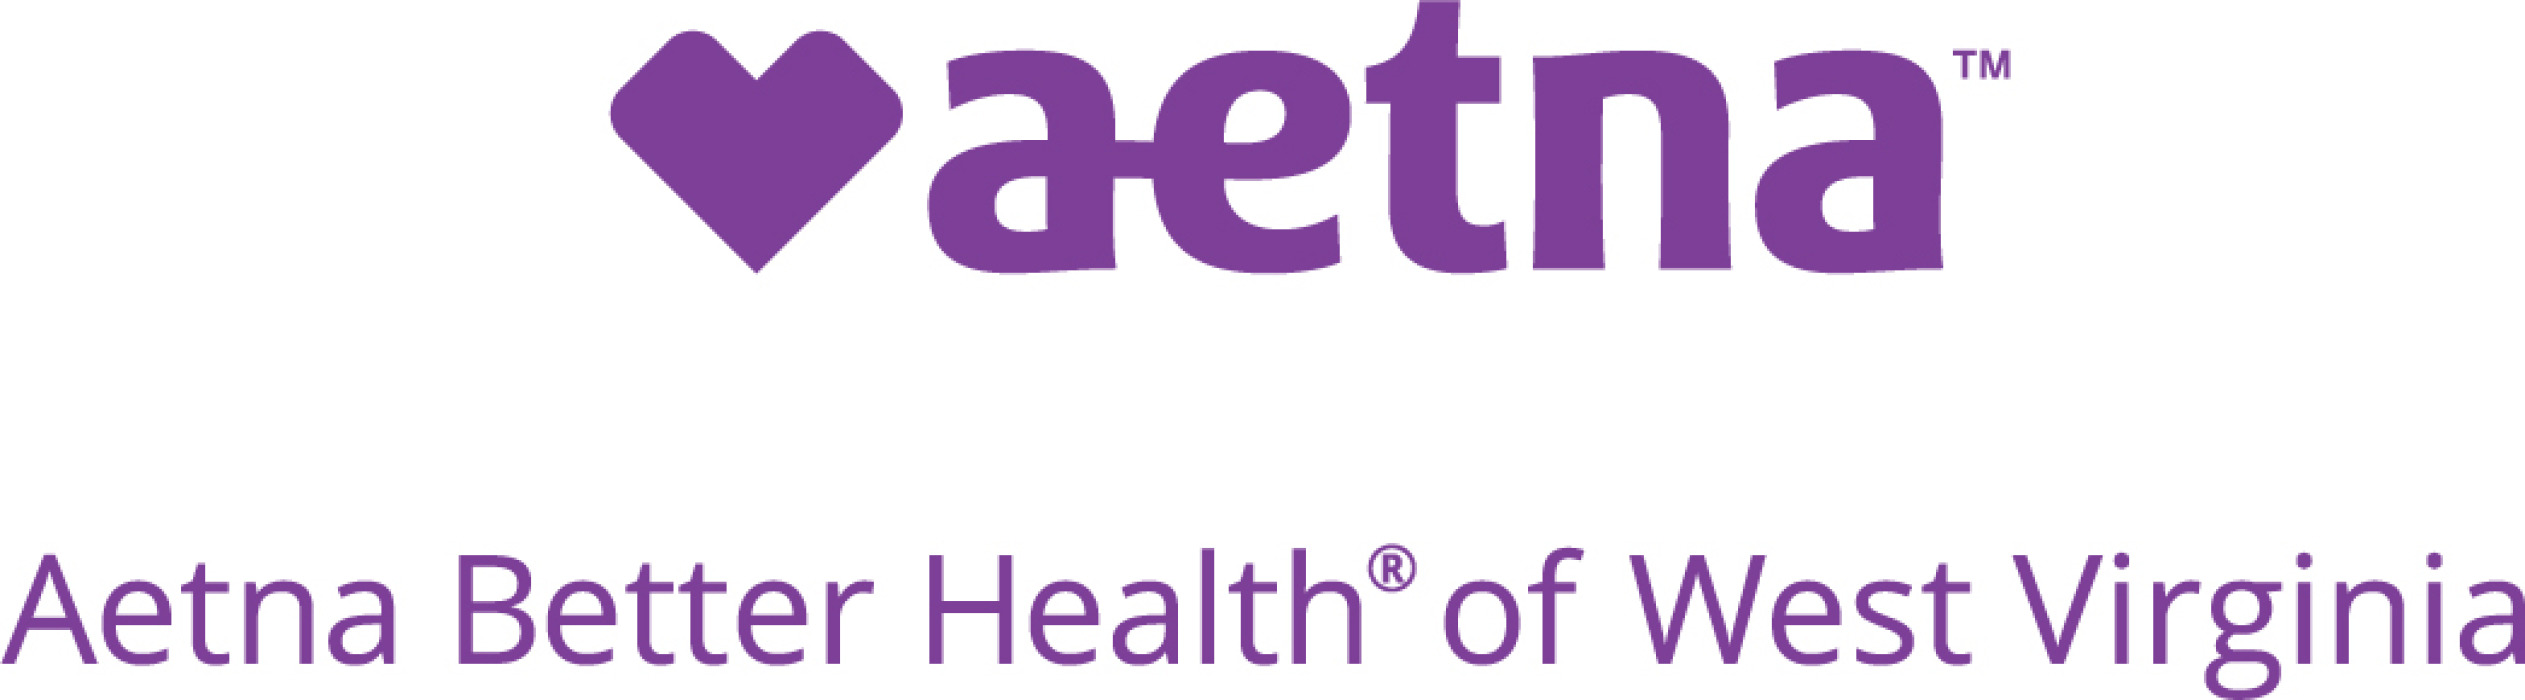 Aetna Better Health of West Virginia